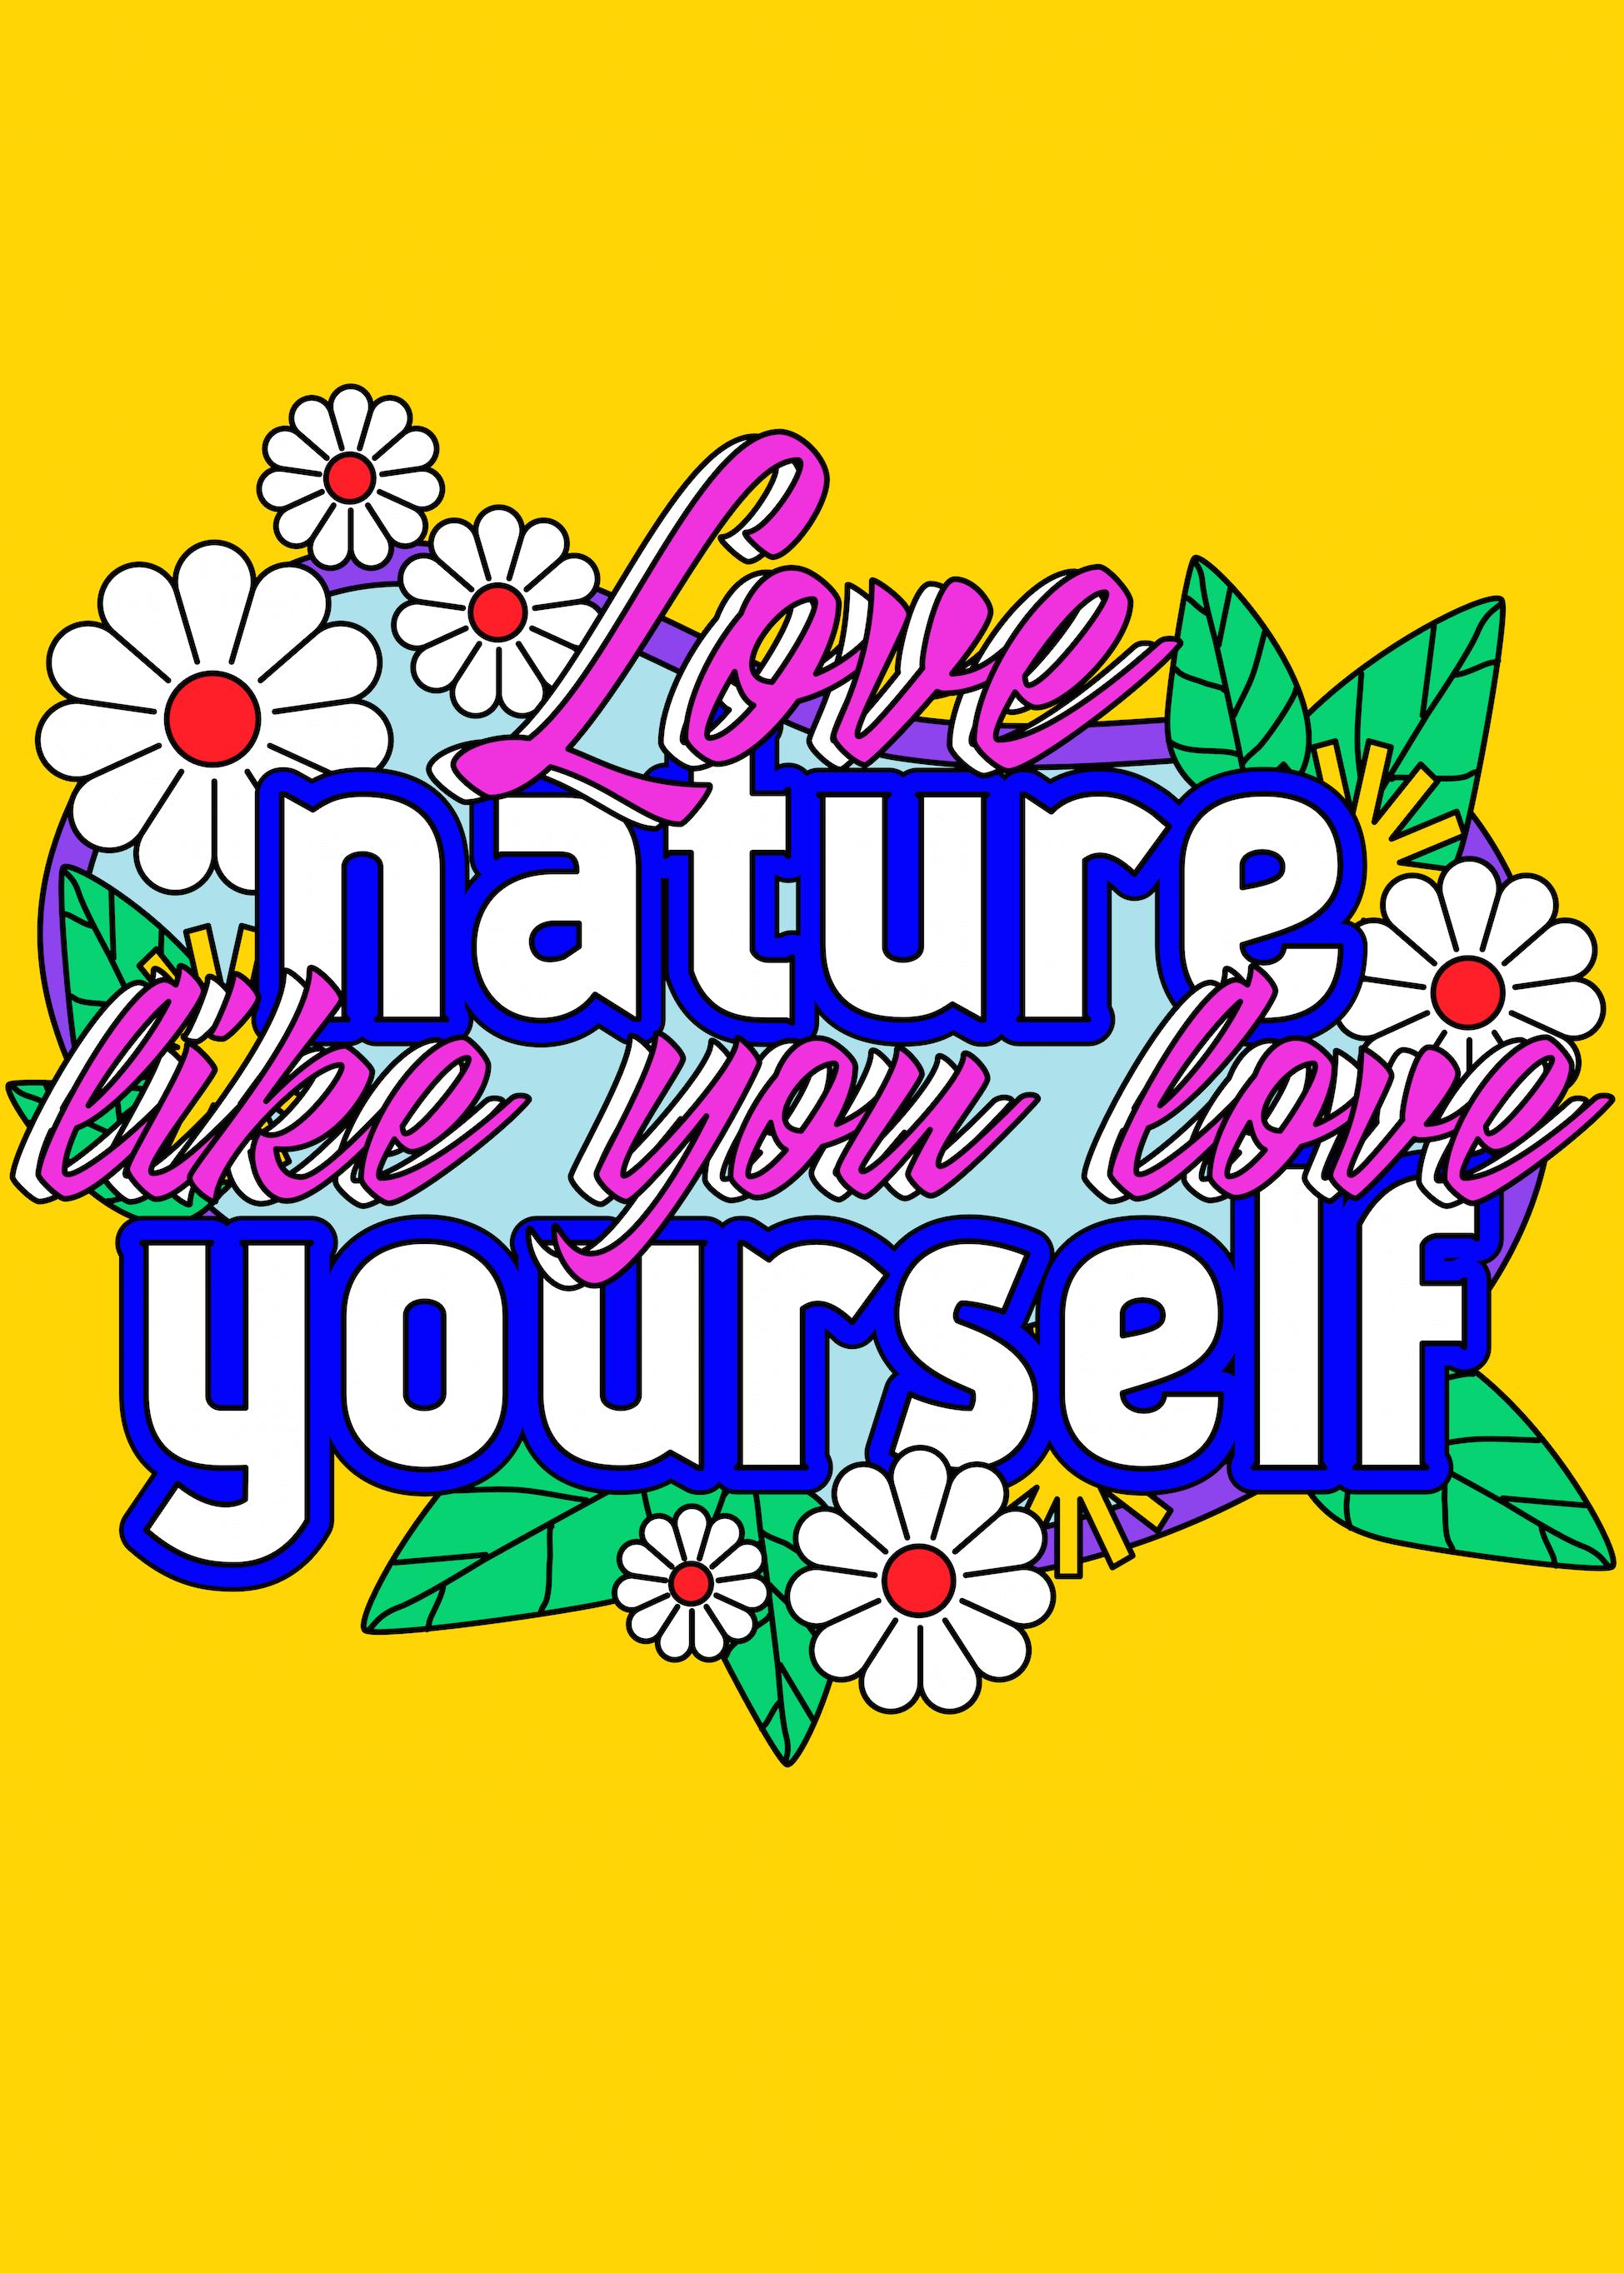 Love Nature Like You Love Yourself main image